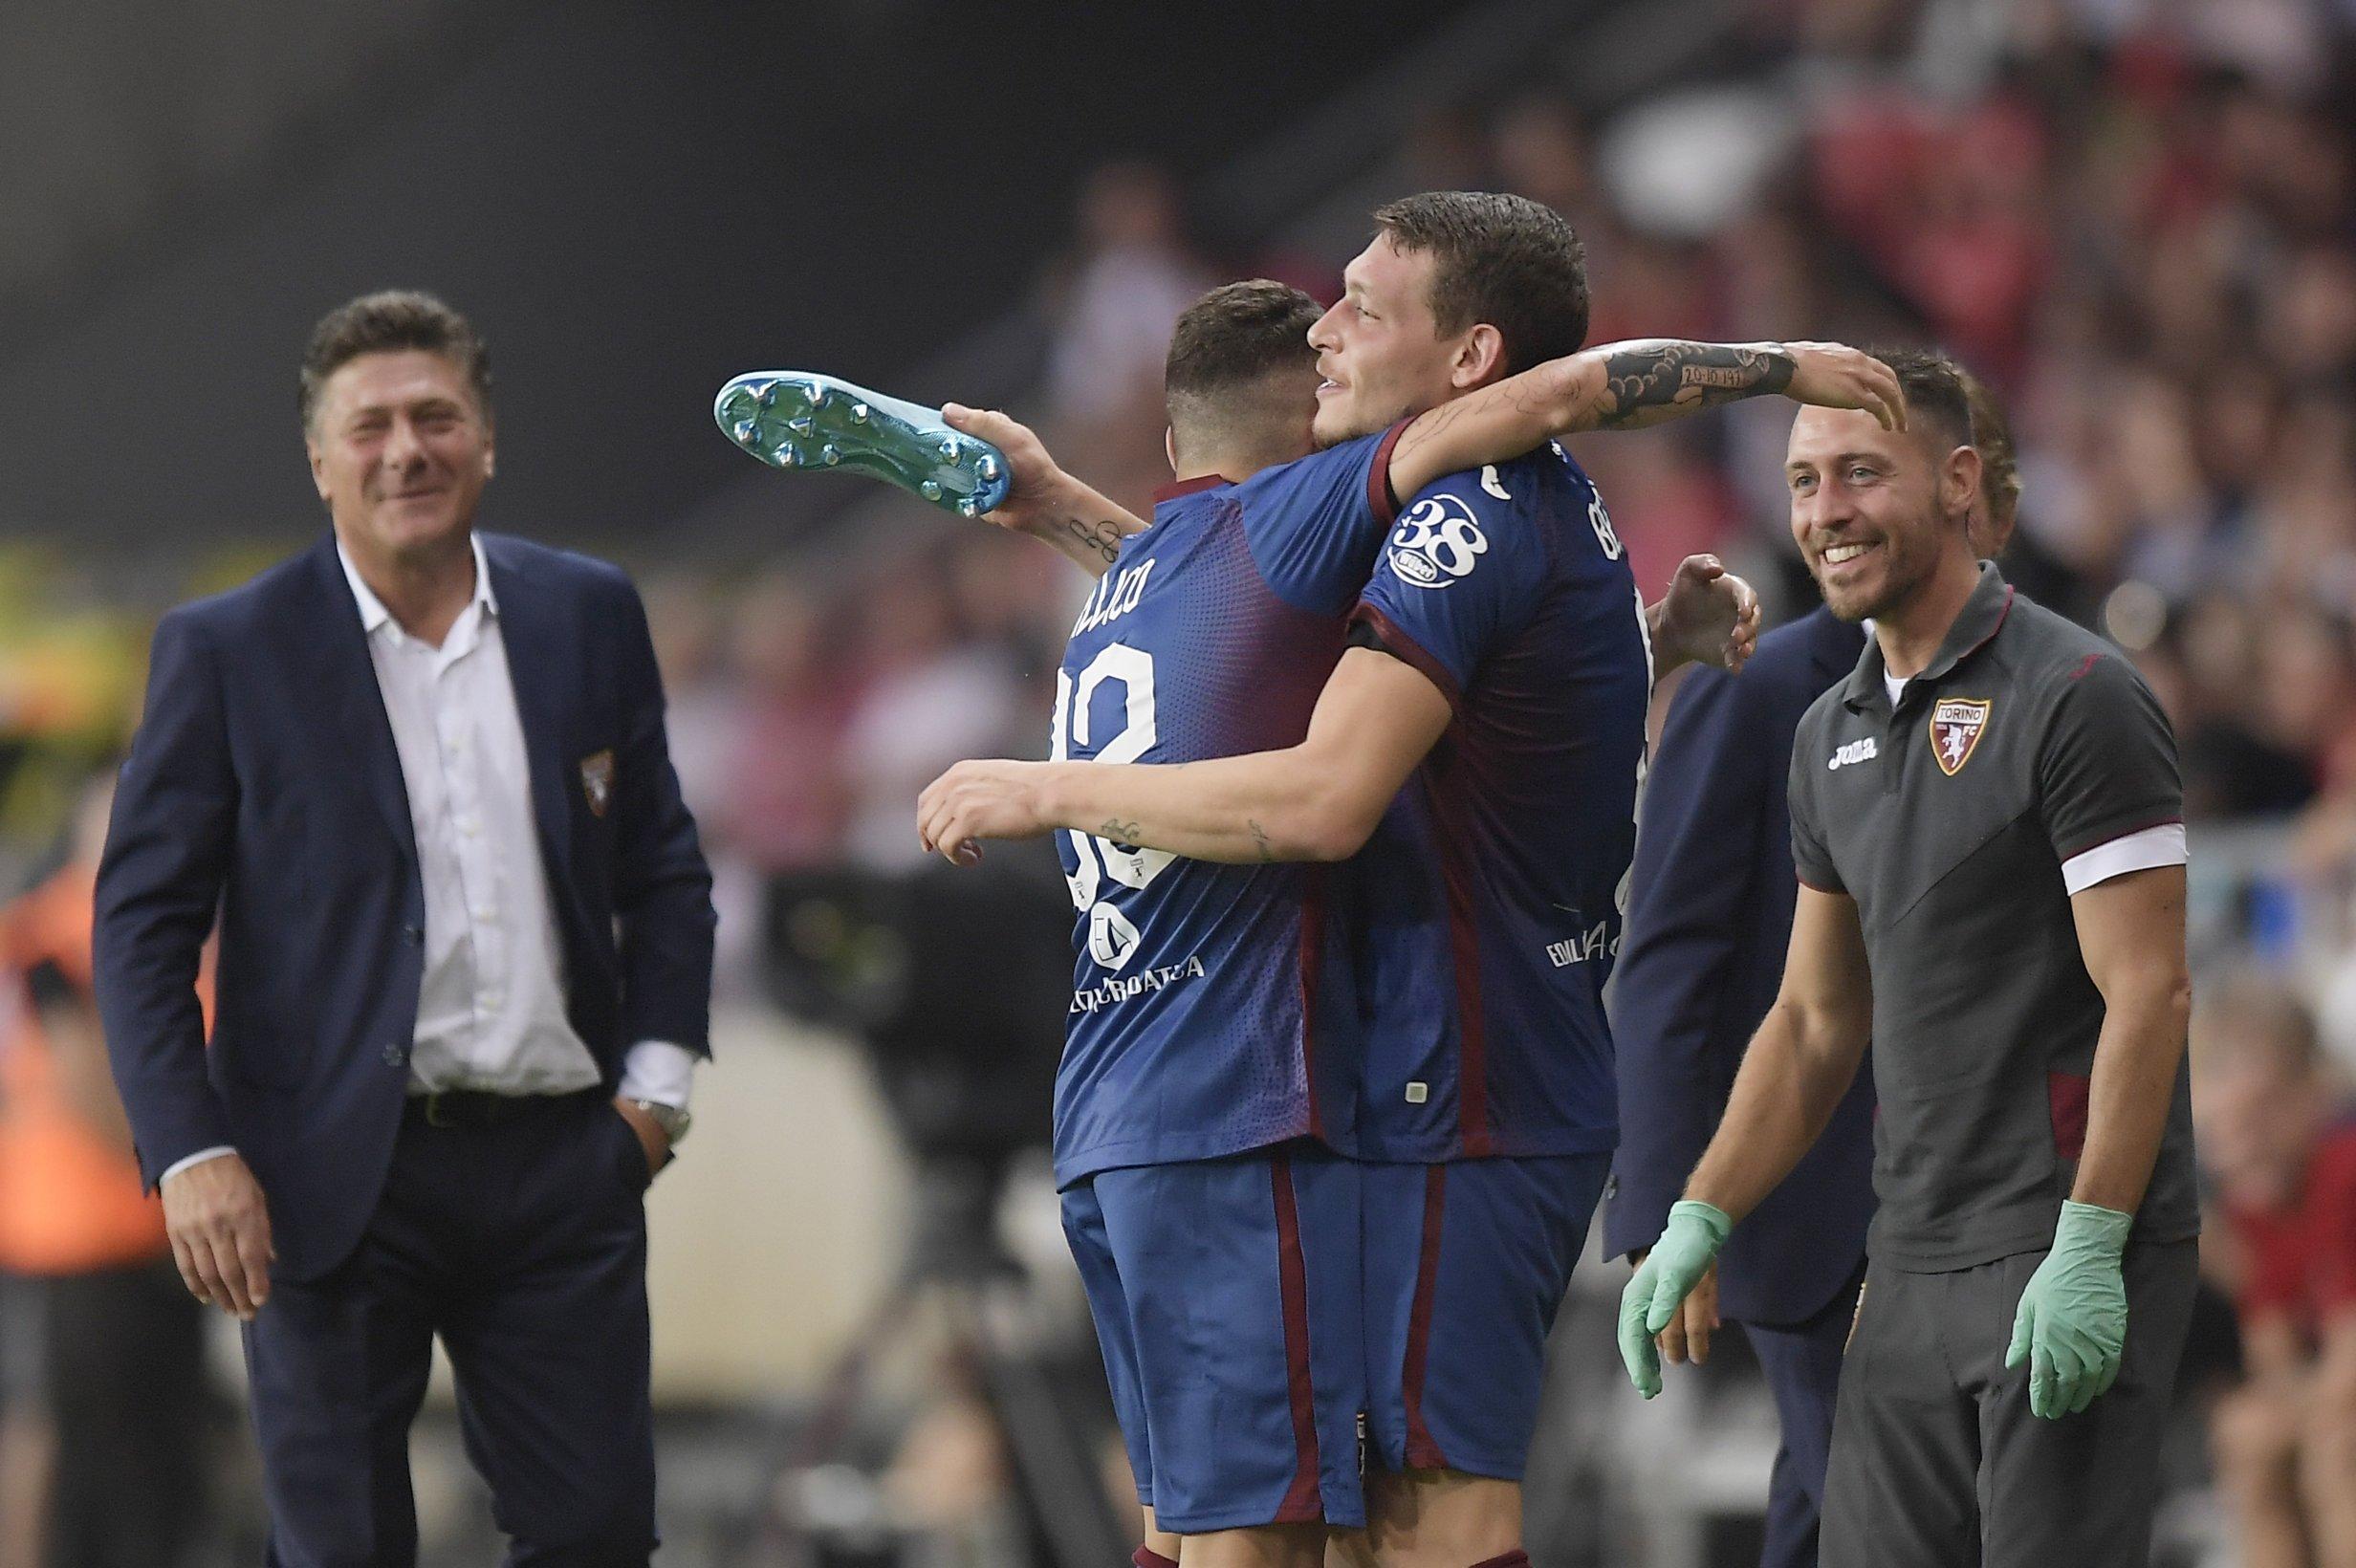 Europa League, Torino - Shakhtyor Soligorsk giovedì sarà in diretta su Sky Sport